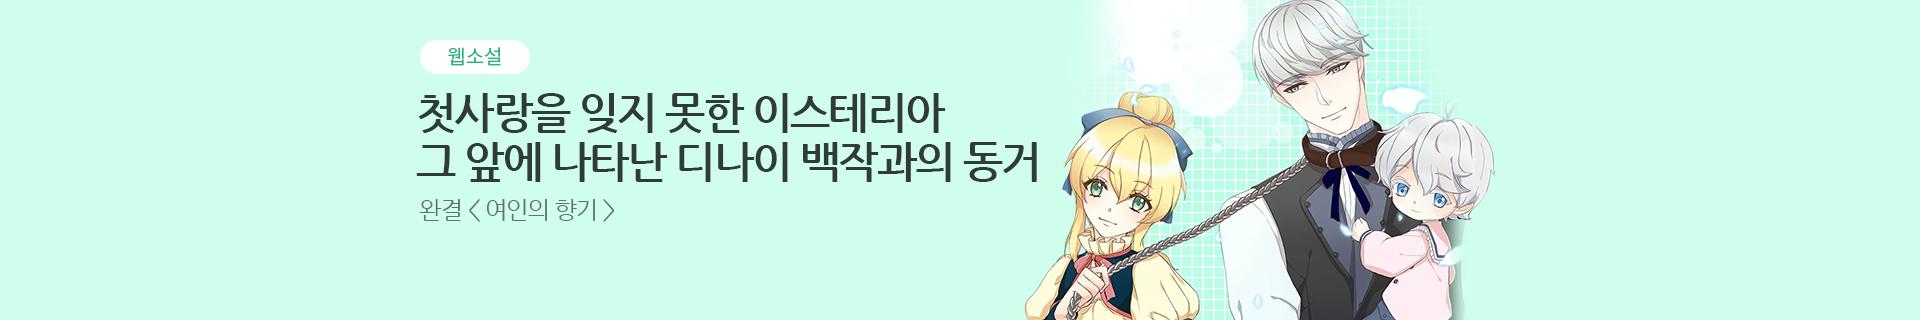 PC_sub_bn_웹소설_여인의향기_1920_320.jpg